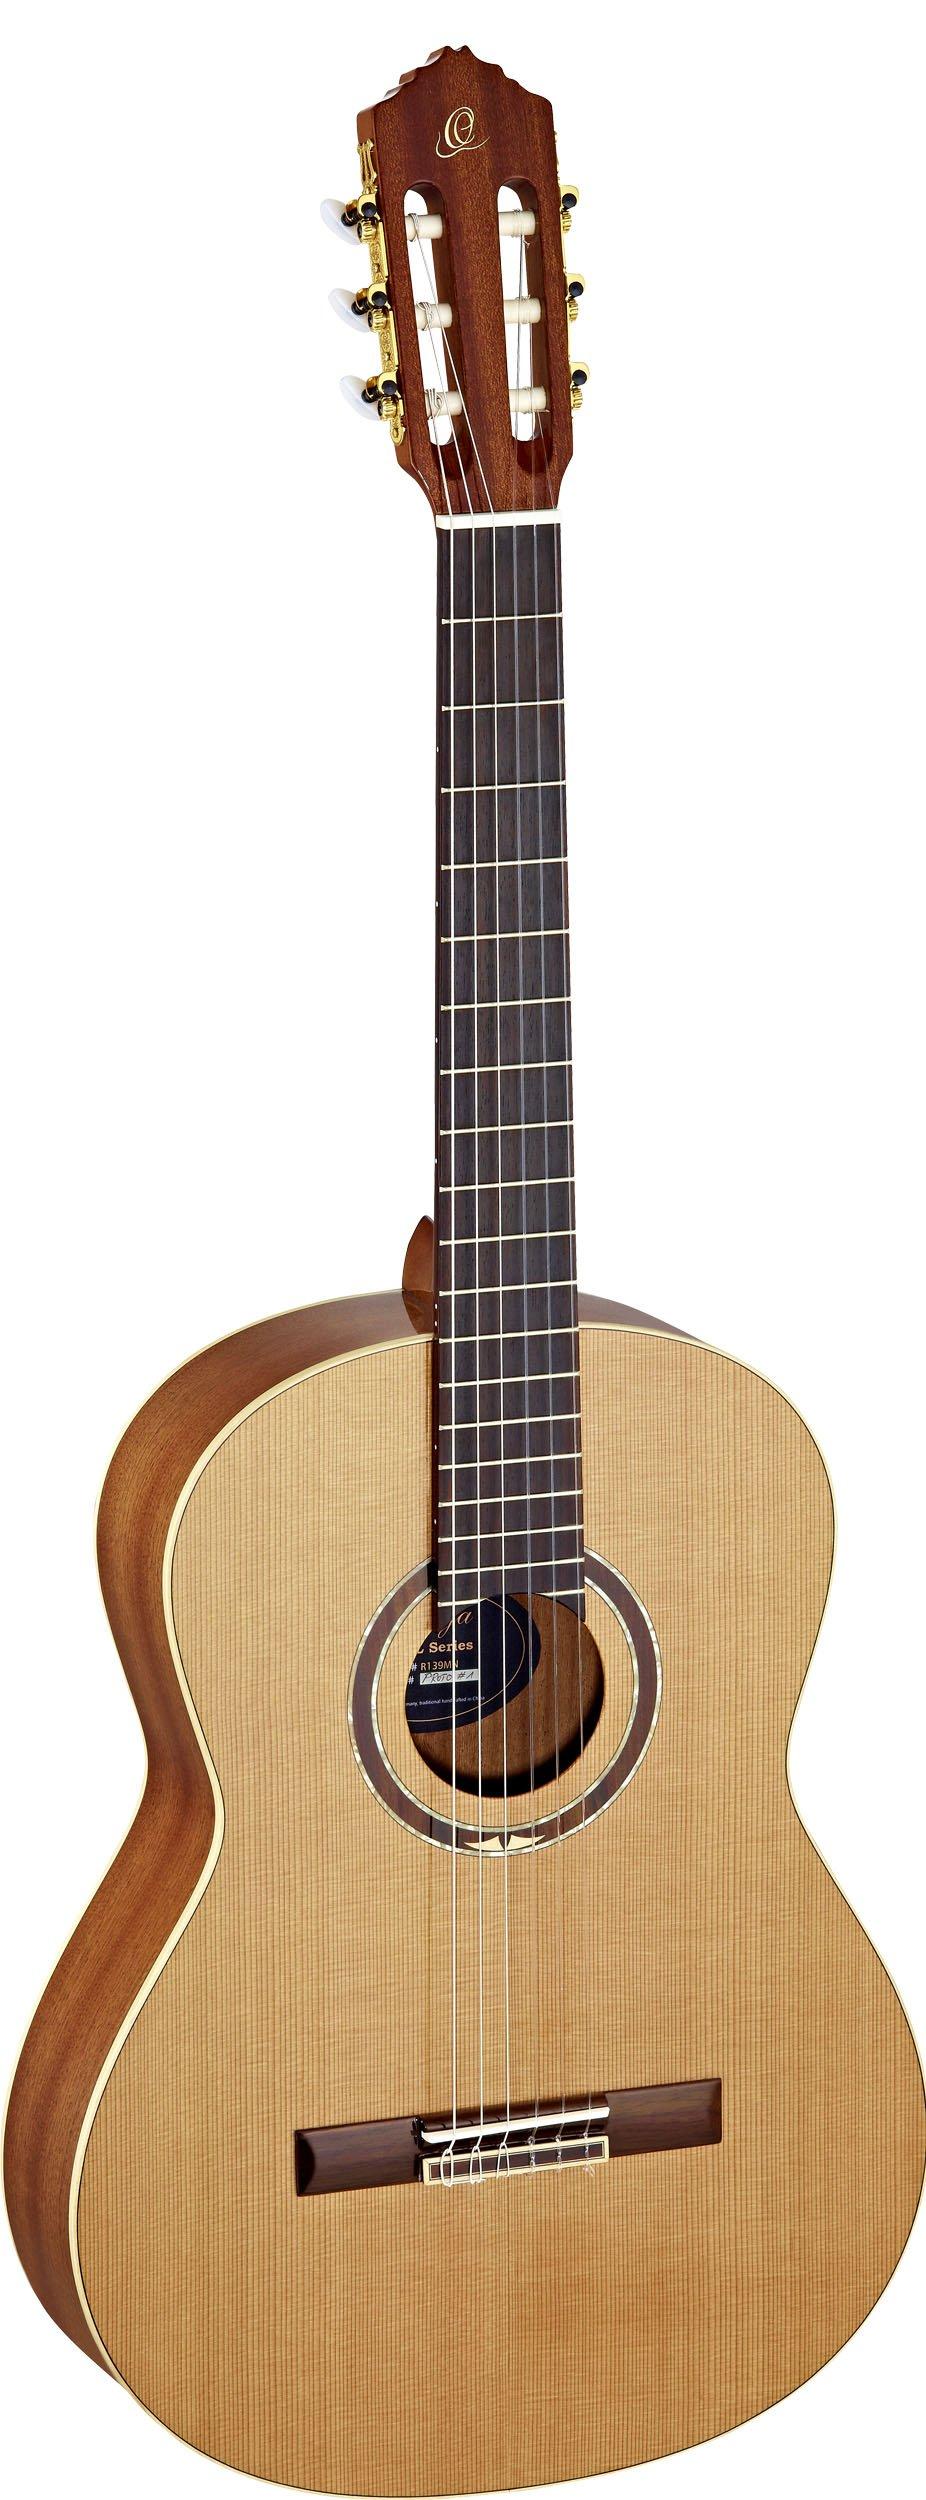 Ortega Guitars R139MN Feel Series Medium Neck Nylon 6-String Guitar with Cedar Top and Mahogany Body